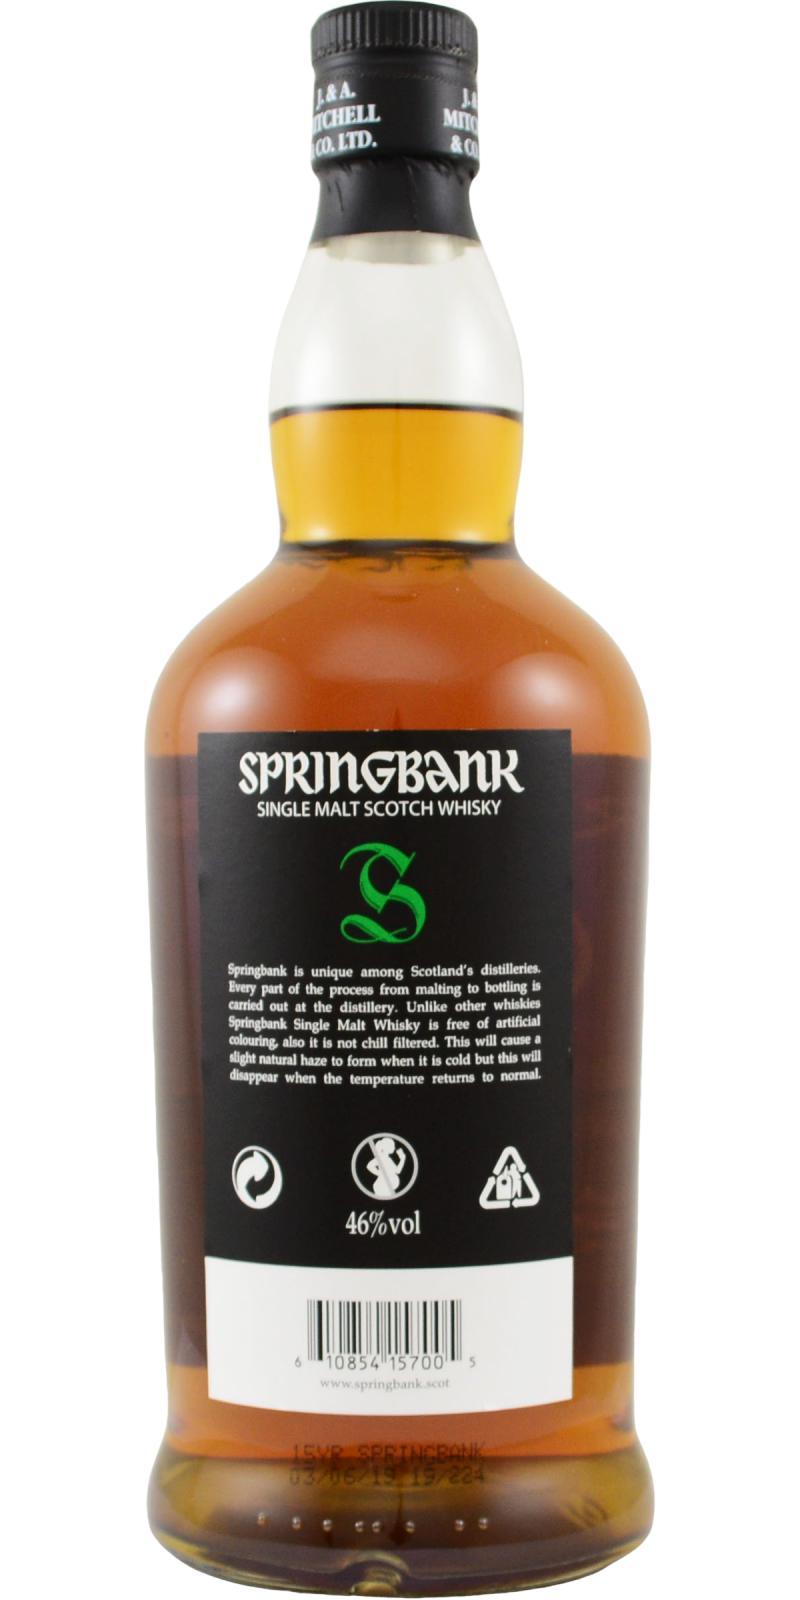 Springbank 15-year-old